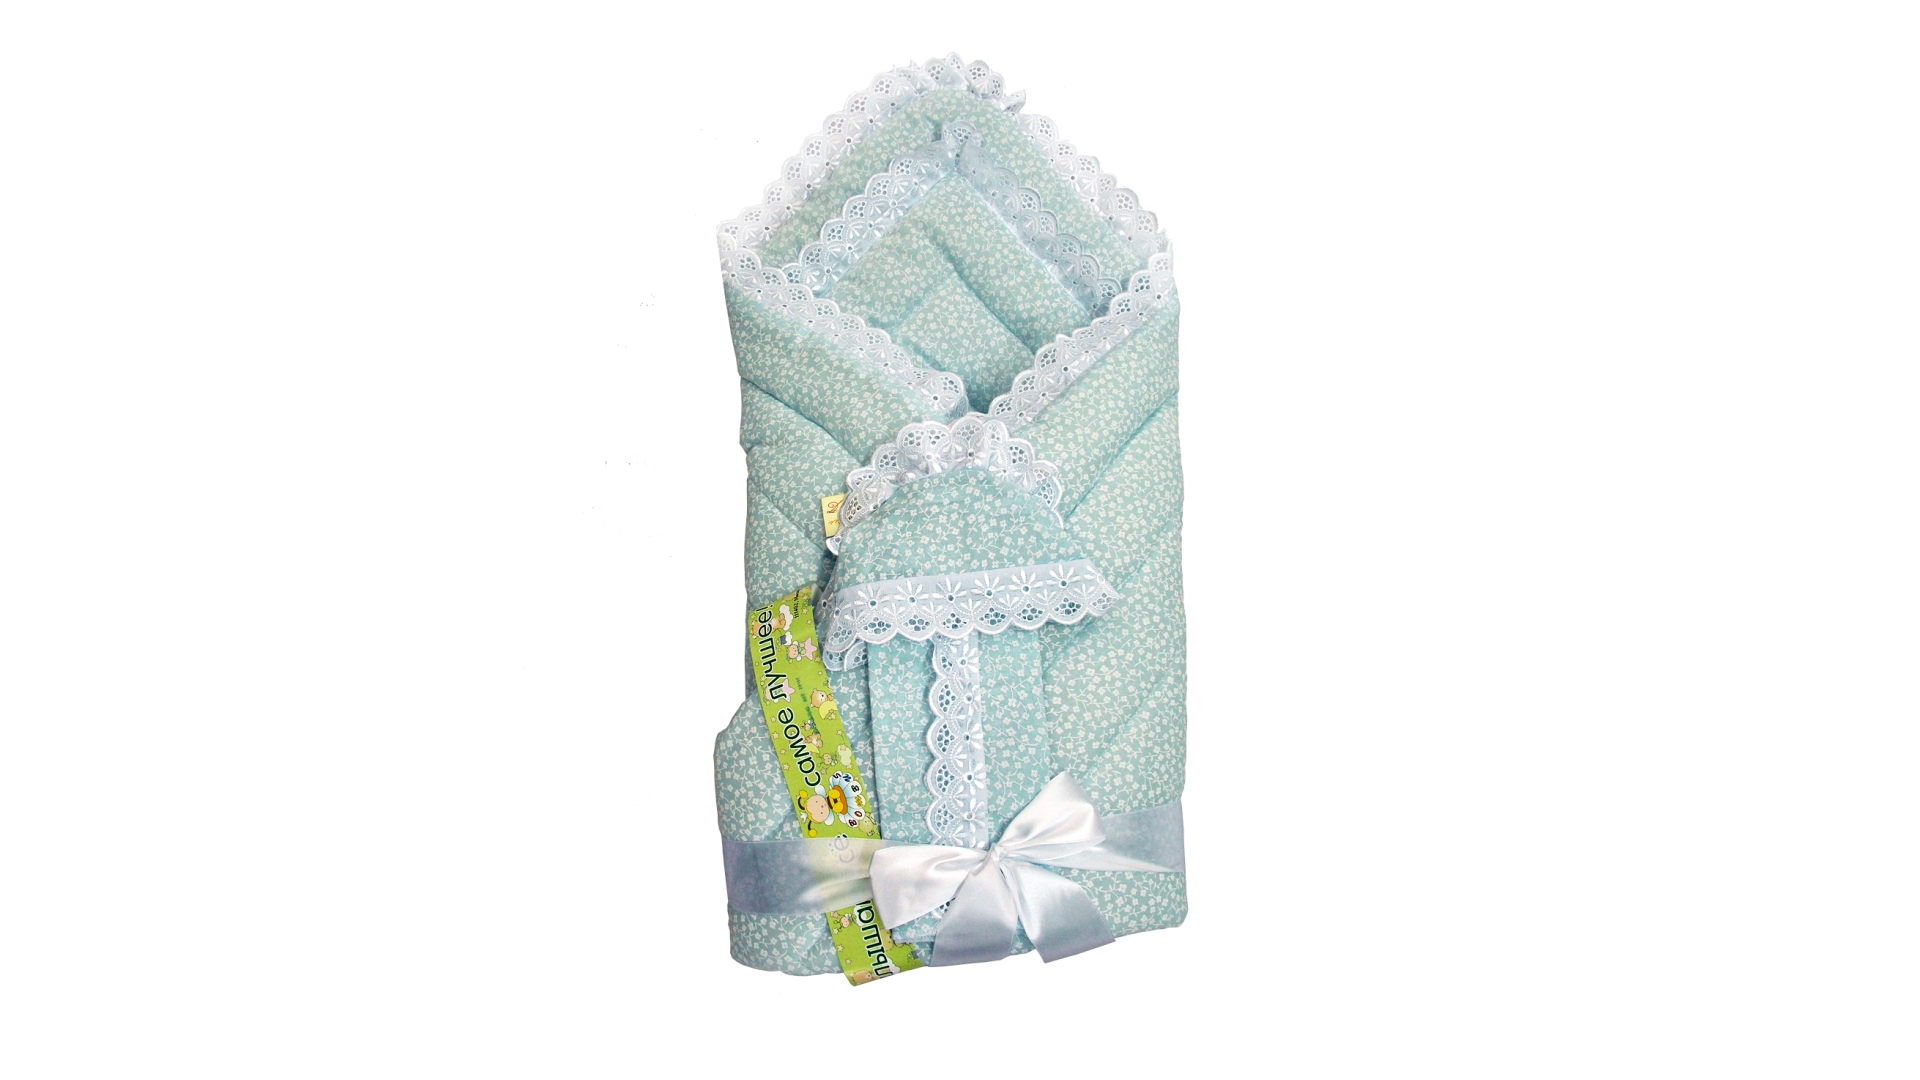 Конверт/одеяло на выписку Фунтик (голубой) фото FullHD (0)